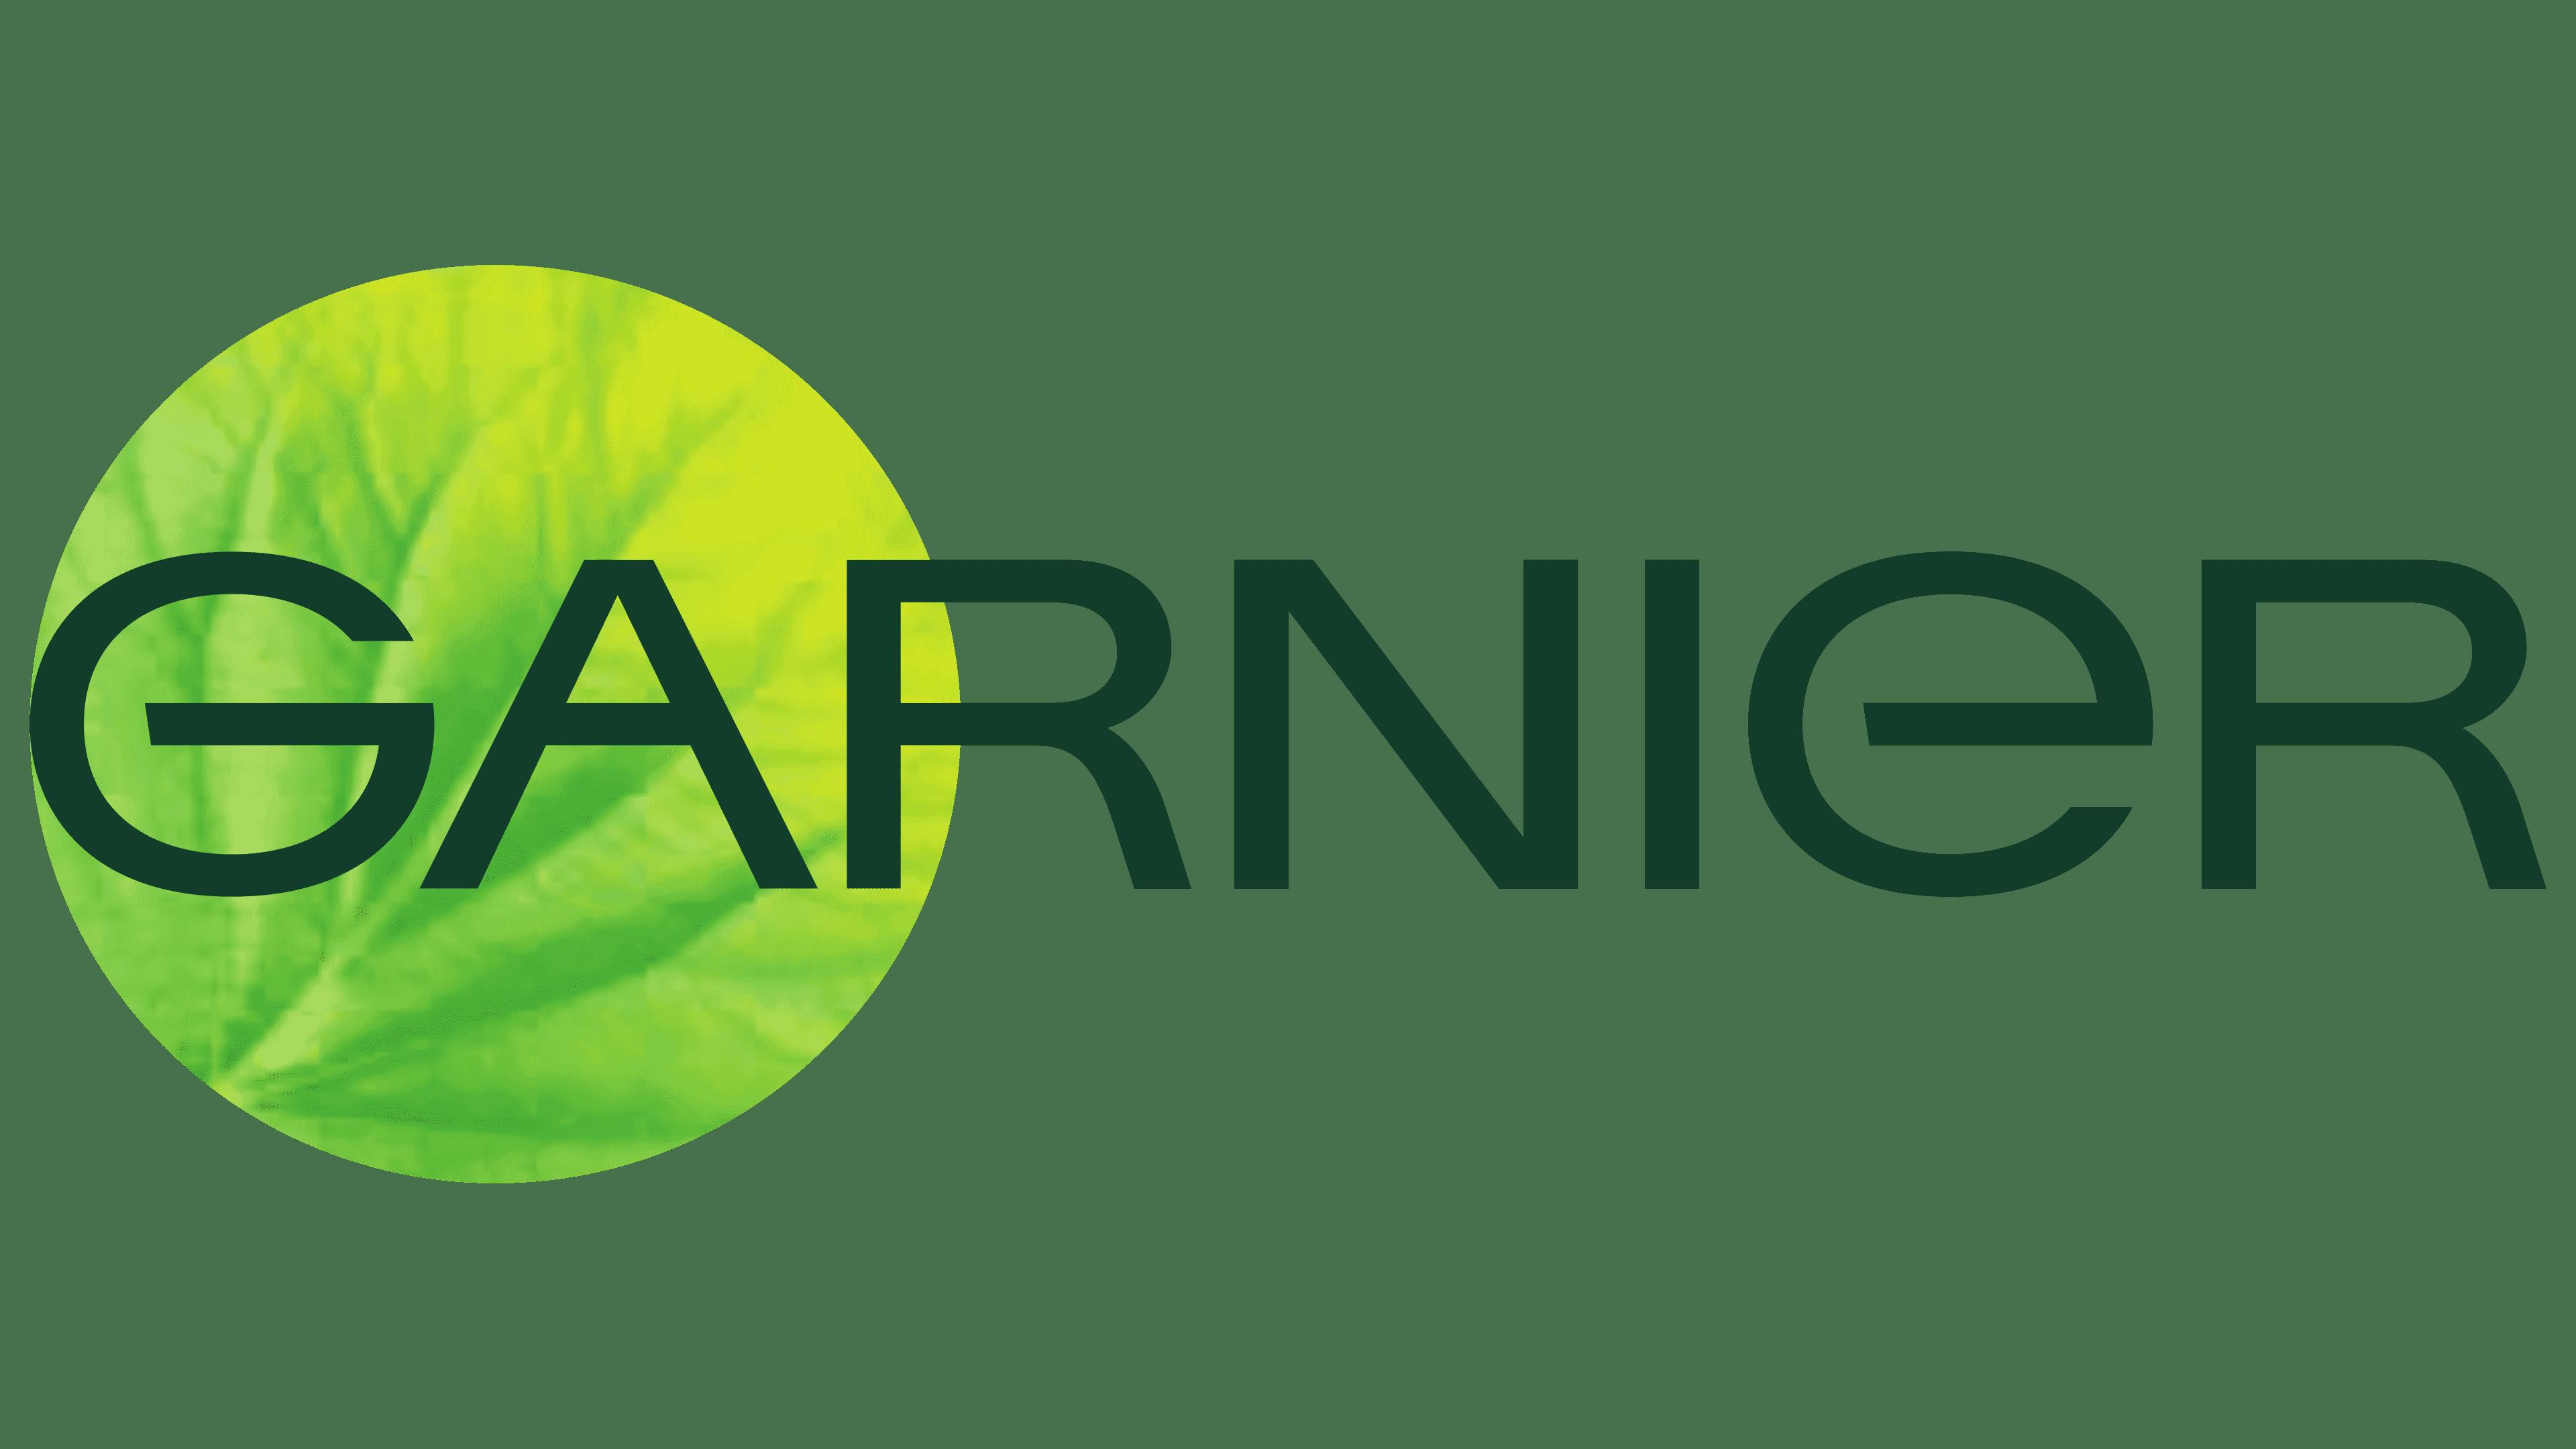 3_Garnier-logo